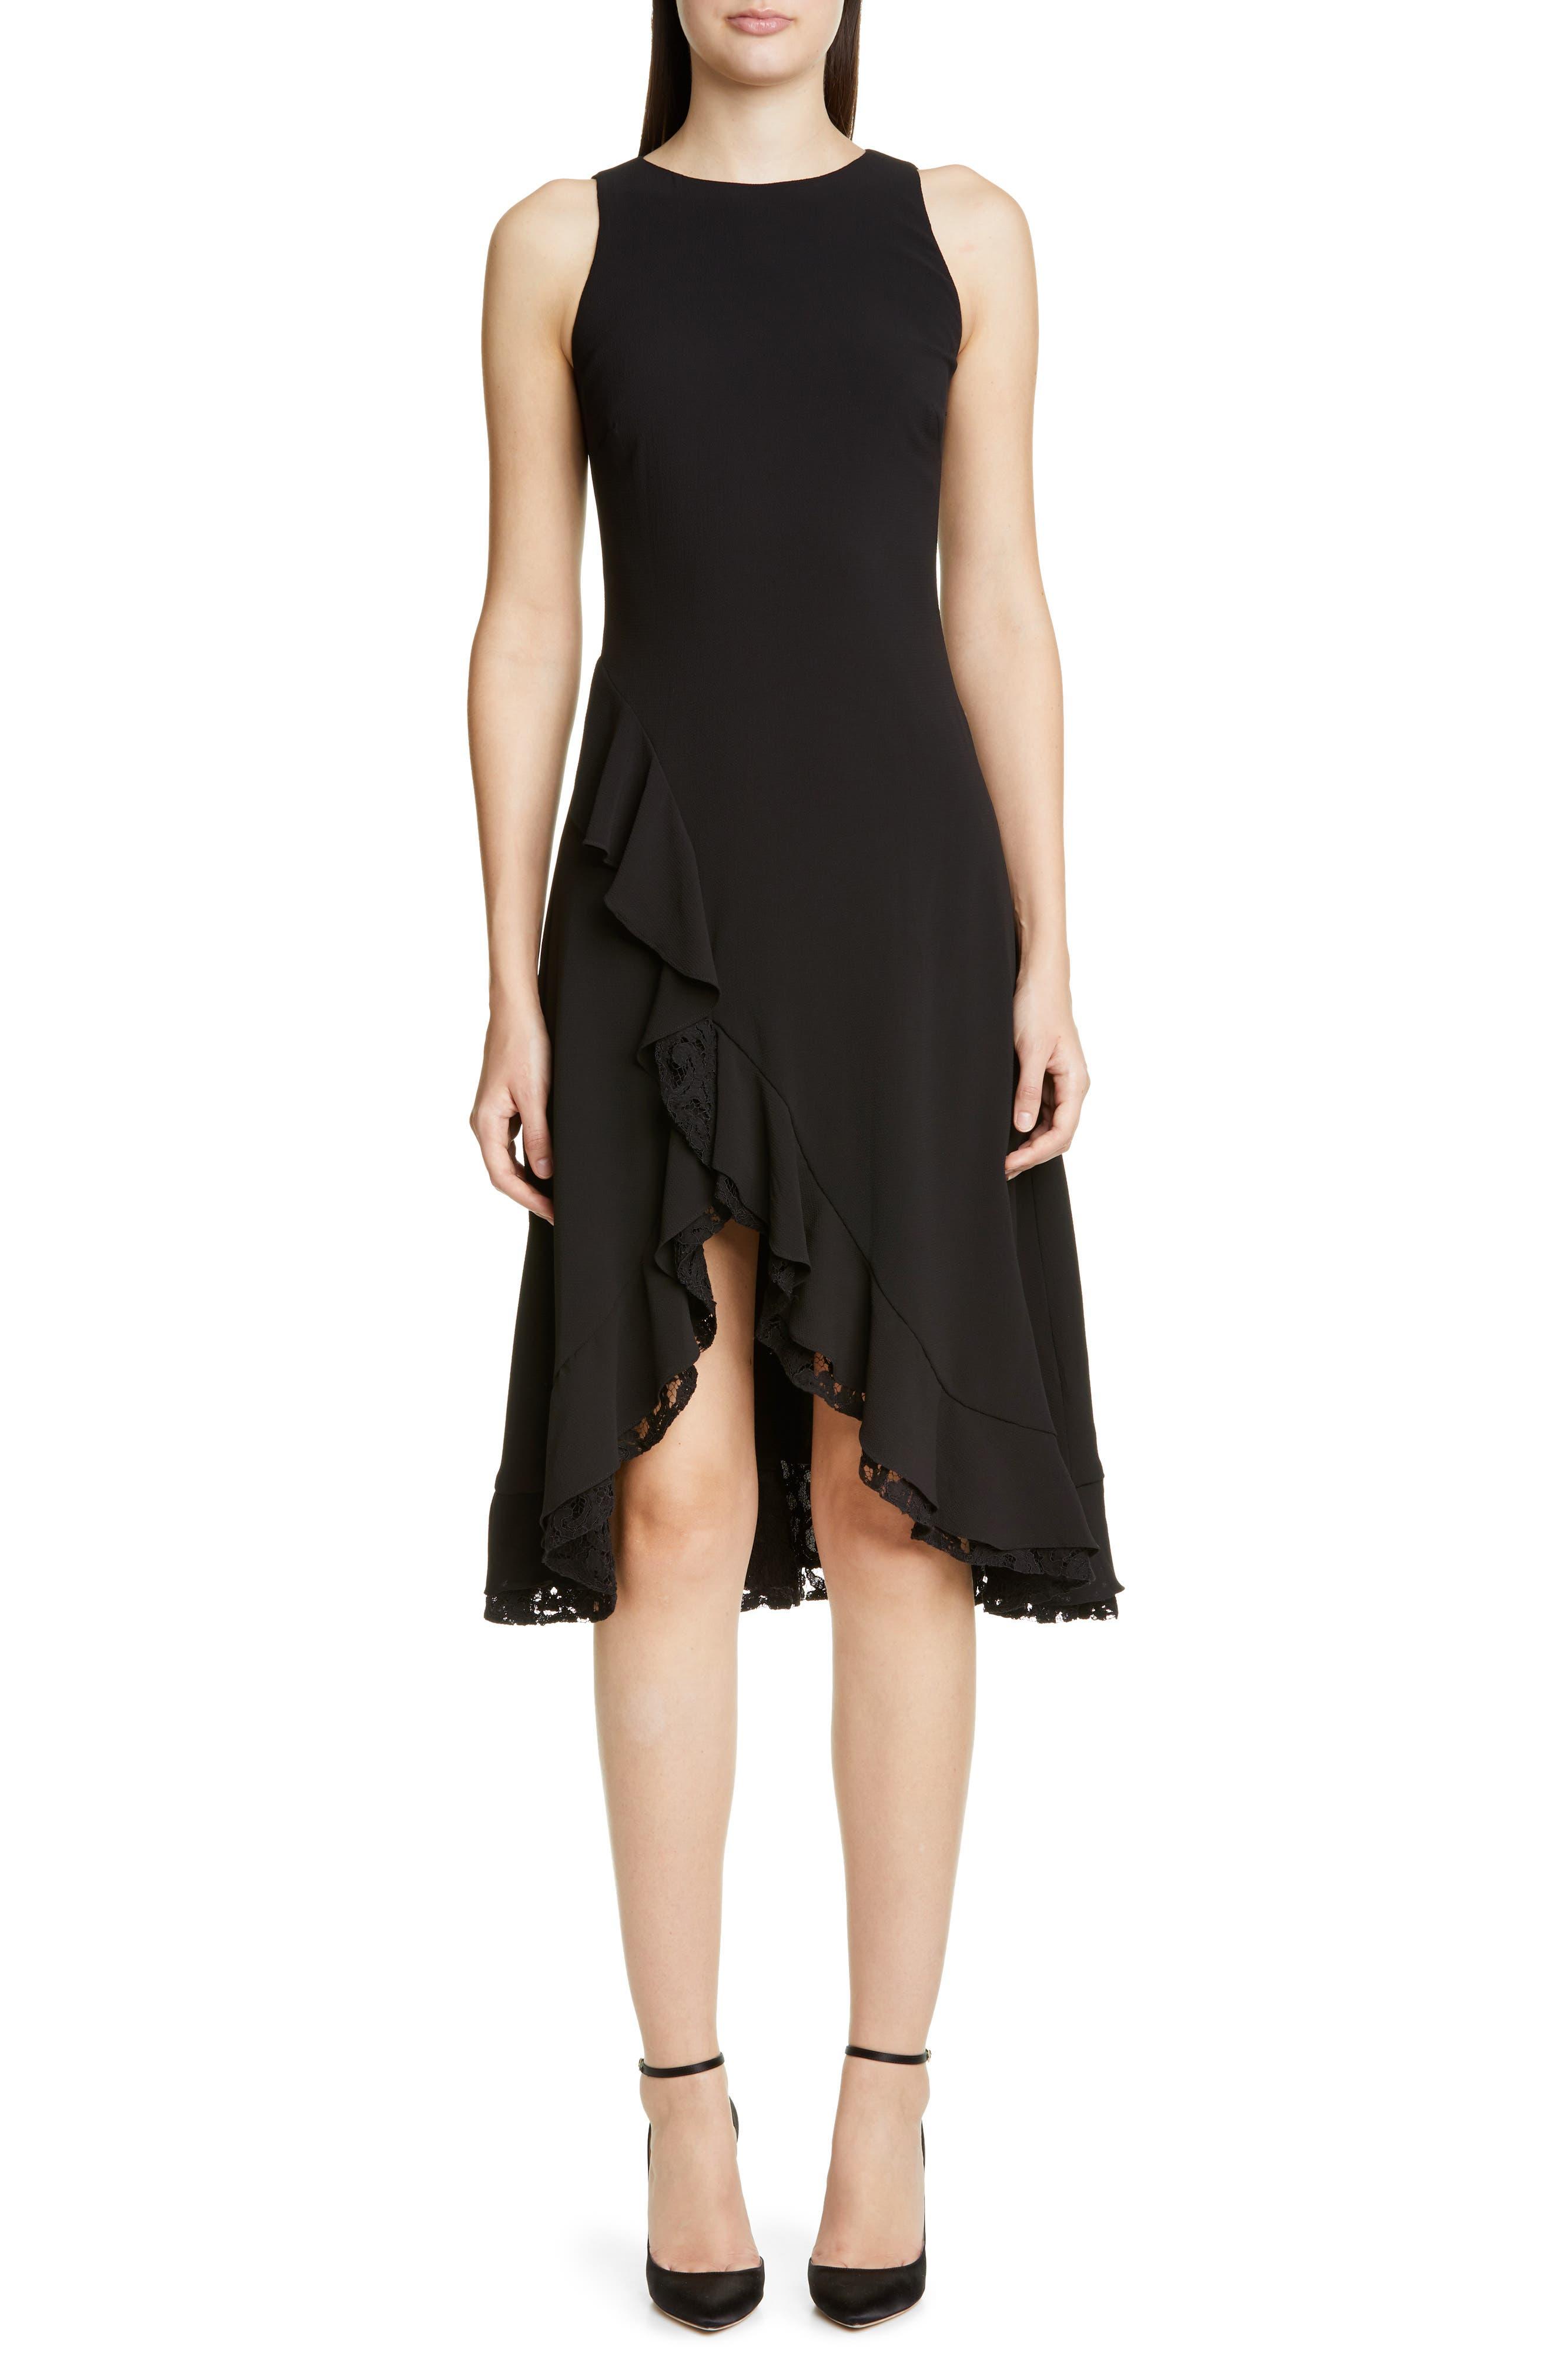 Zac Zac Posen Janice Ruffle Cocktail Dress, Black